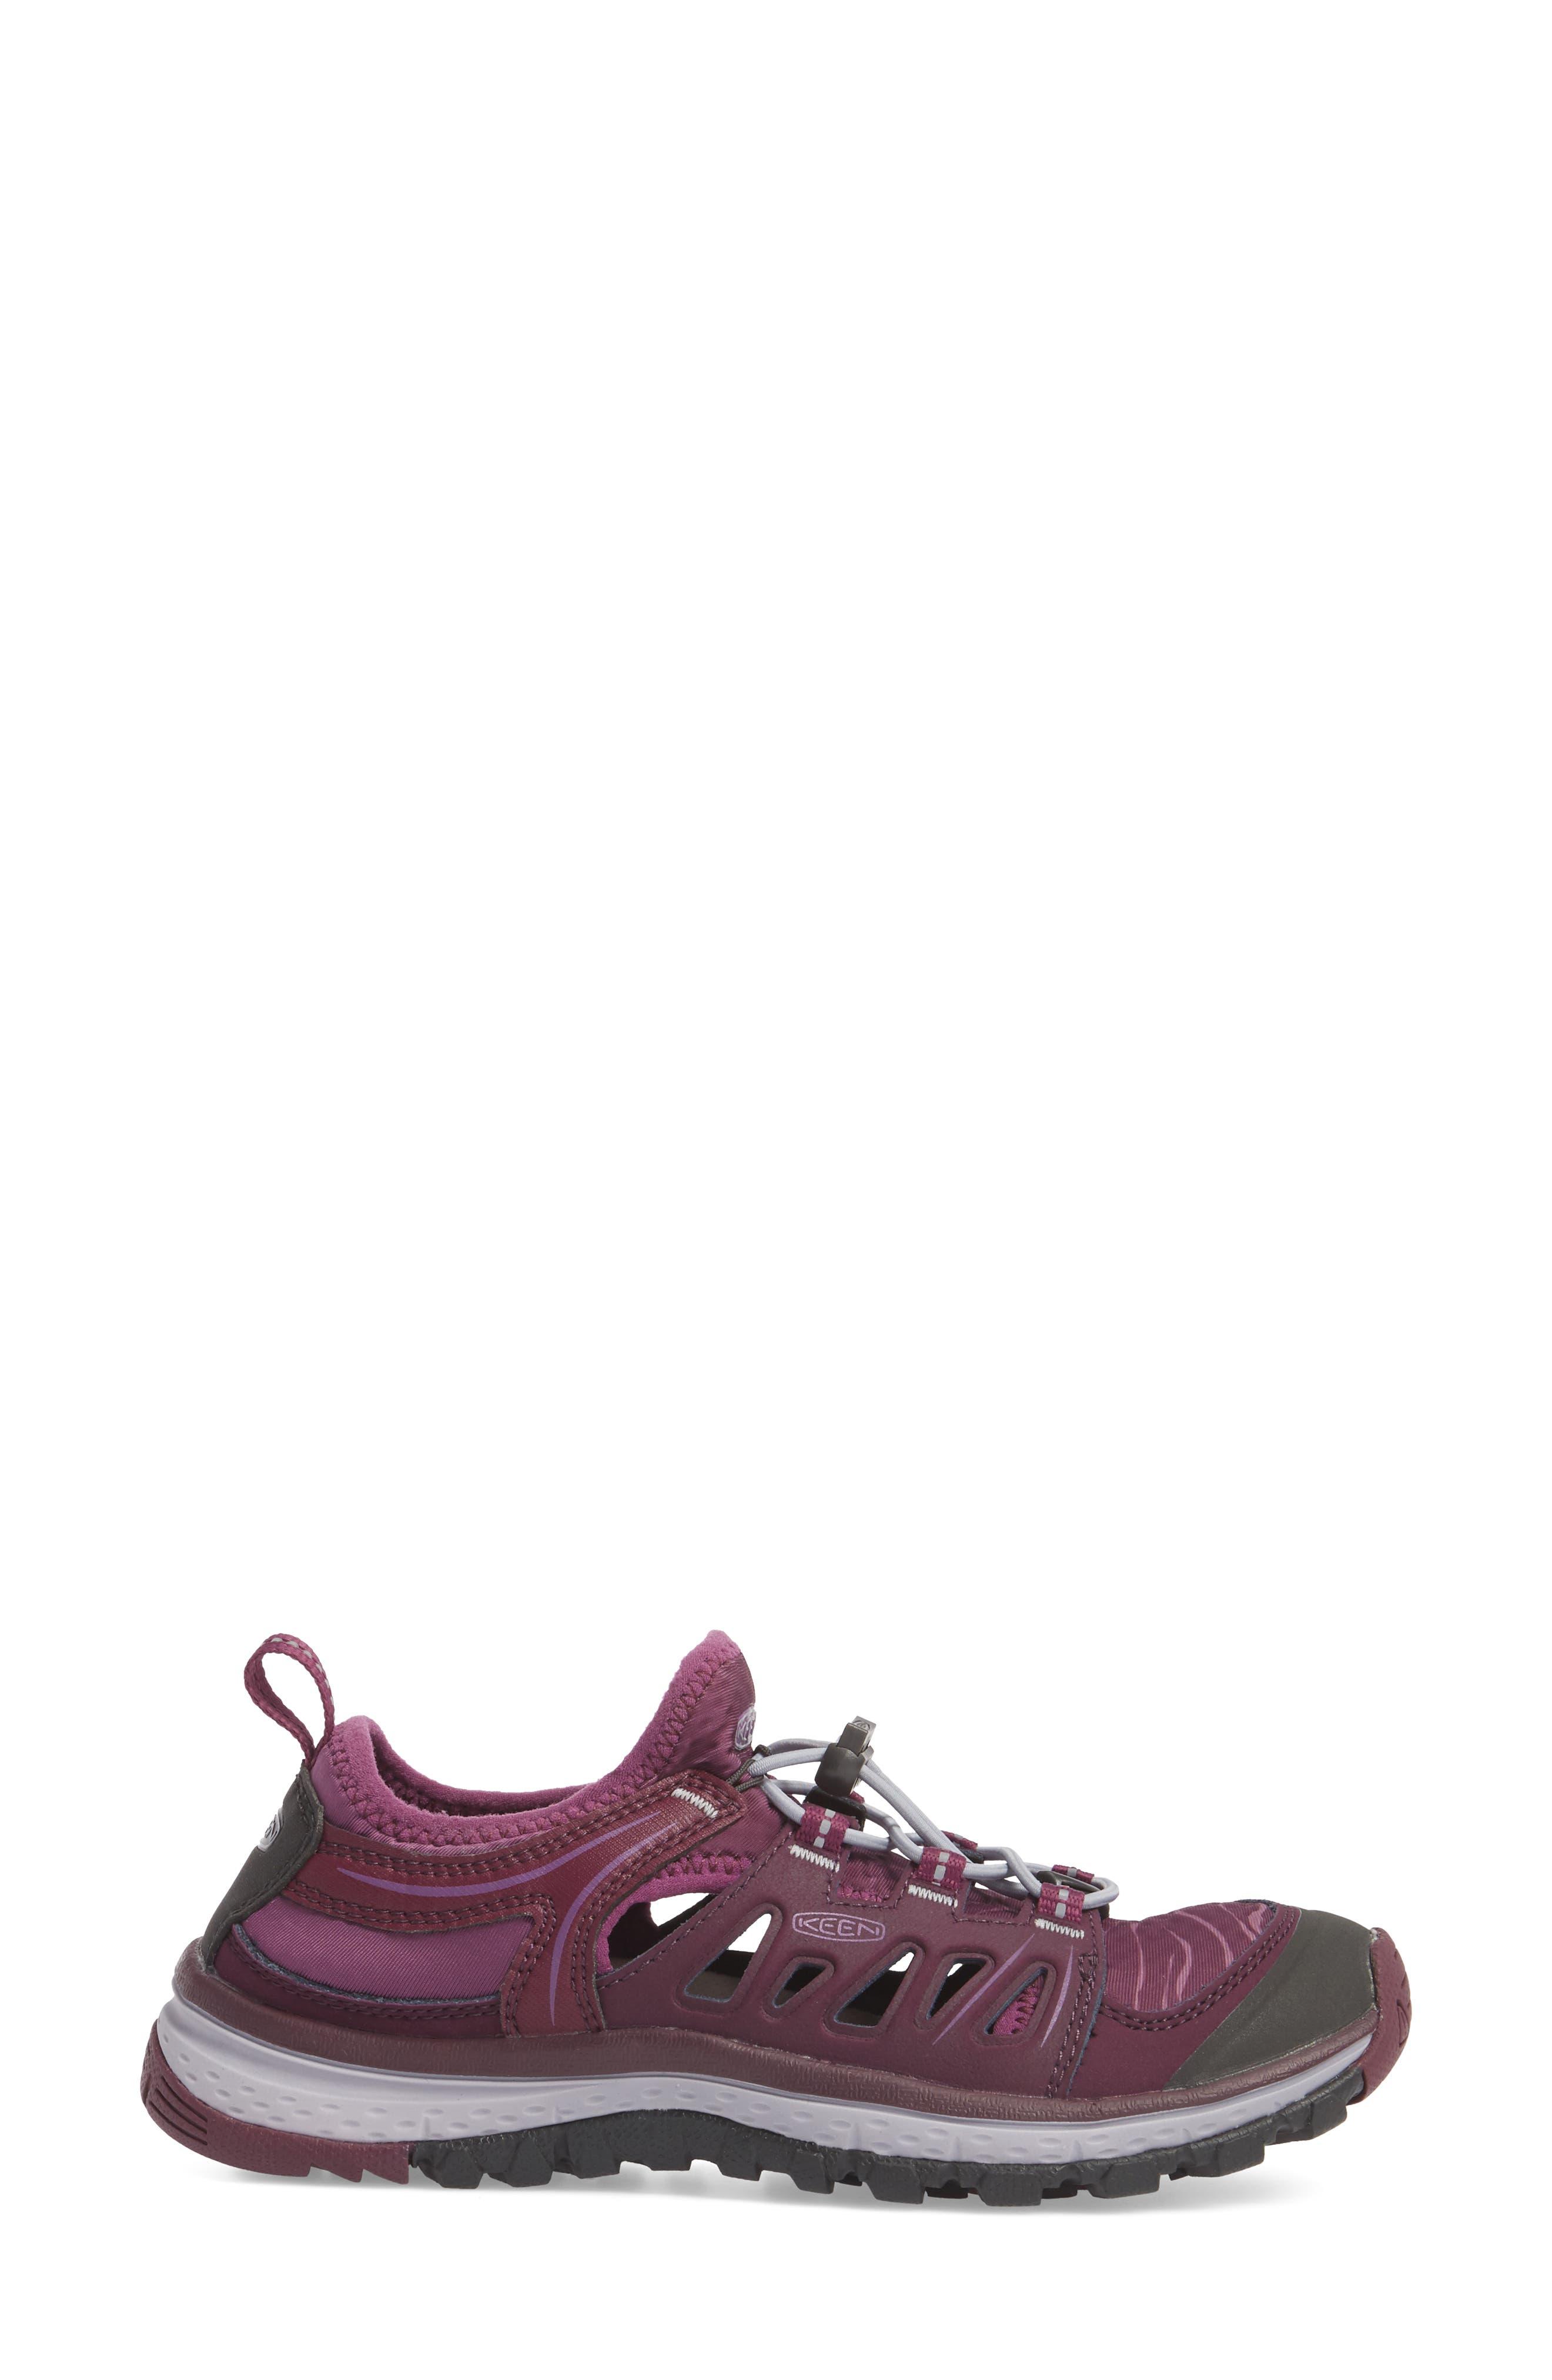 Terradora Ethos Hiking Sneaker,                             Alternate thumbnail 3, color,                             Grape Wine/ Grape Kiss